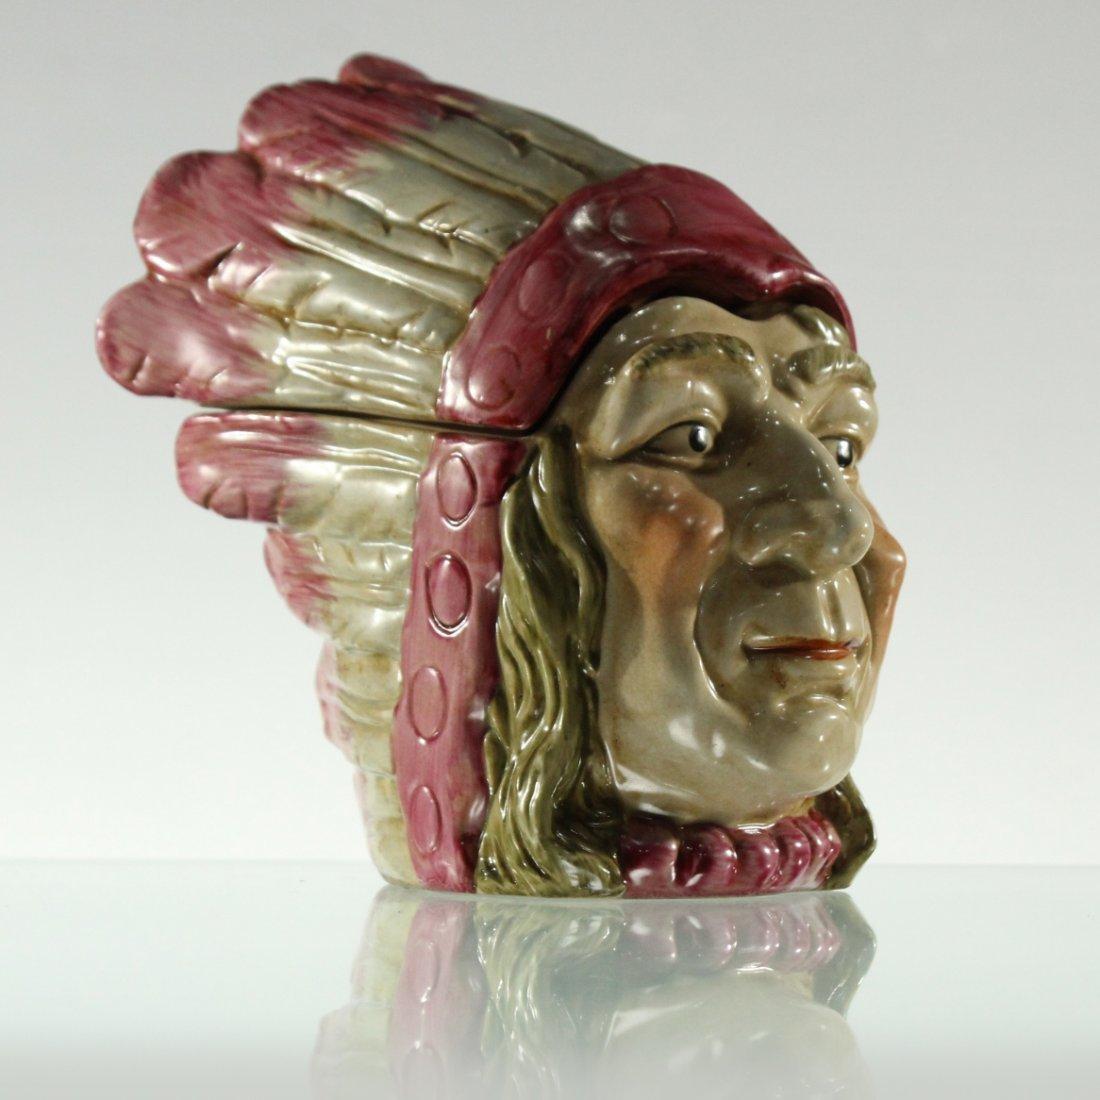 20th C. INDIAN HEAD PORCELAIN COVERED TOBACCO JAR